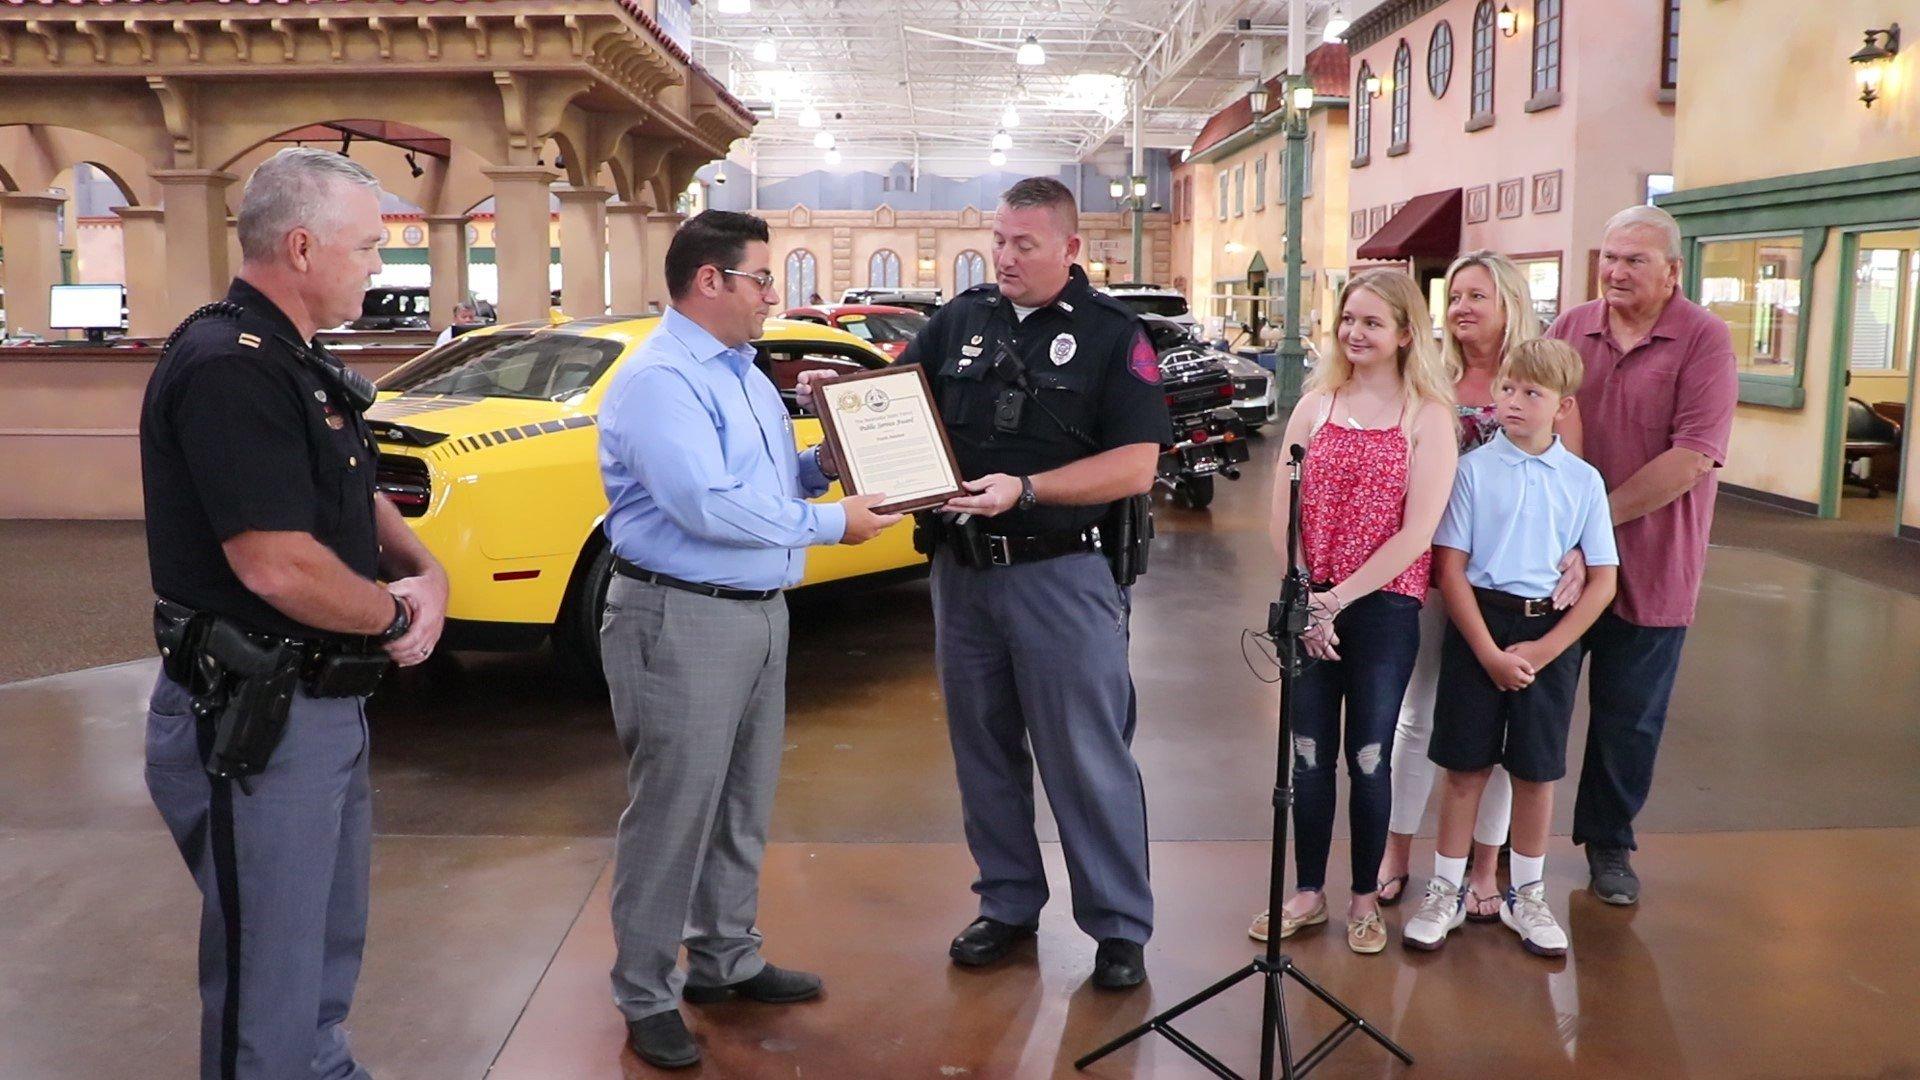 Omaha man presented award for saving two from burning vehicle